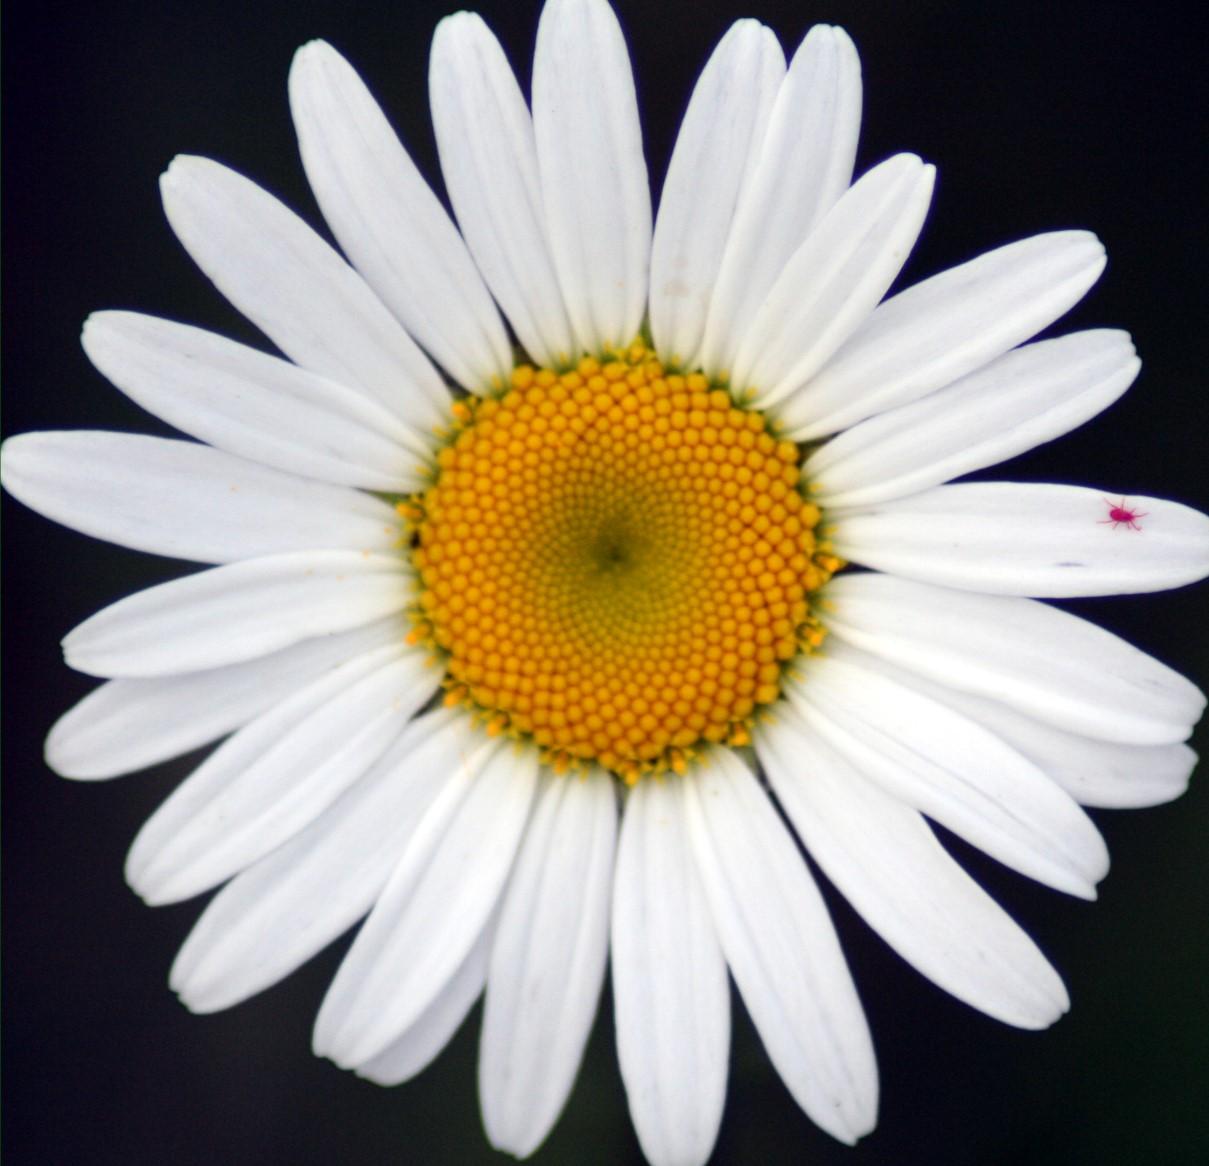 Flower Picture: Daisy Flower # 4